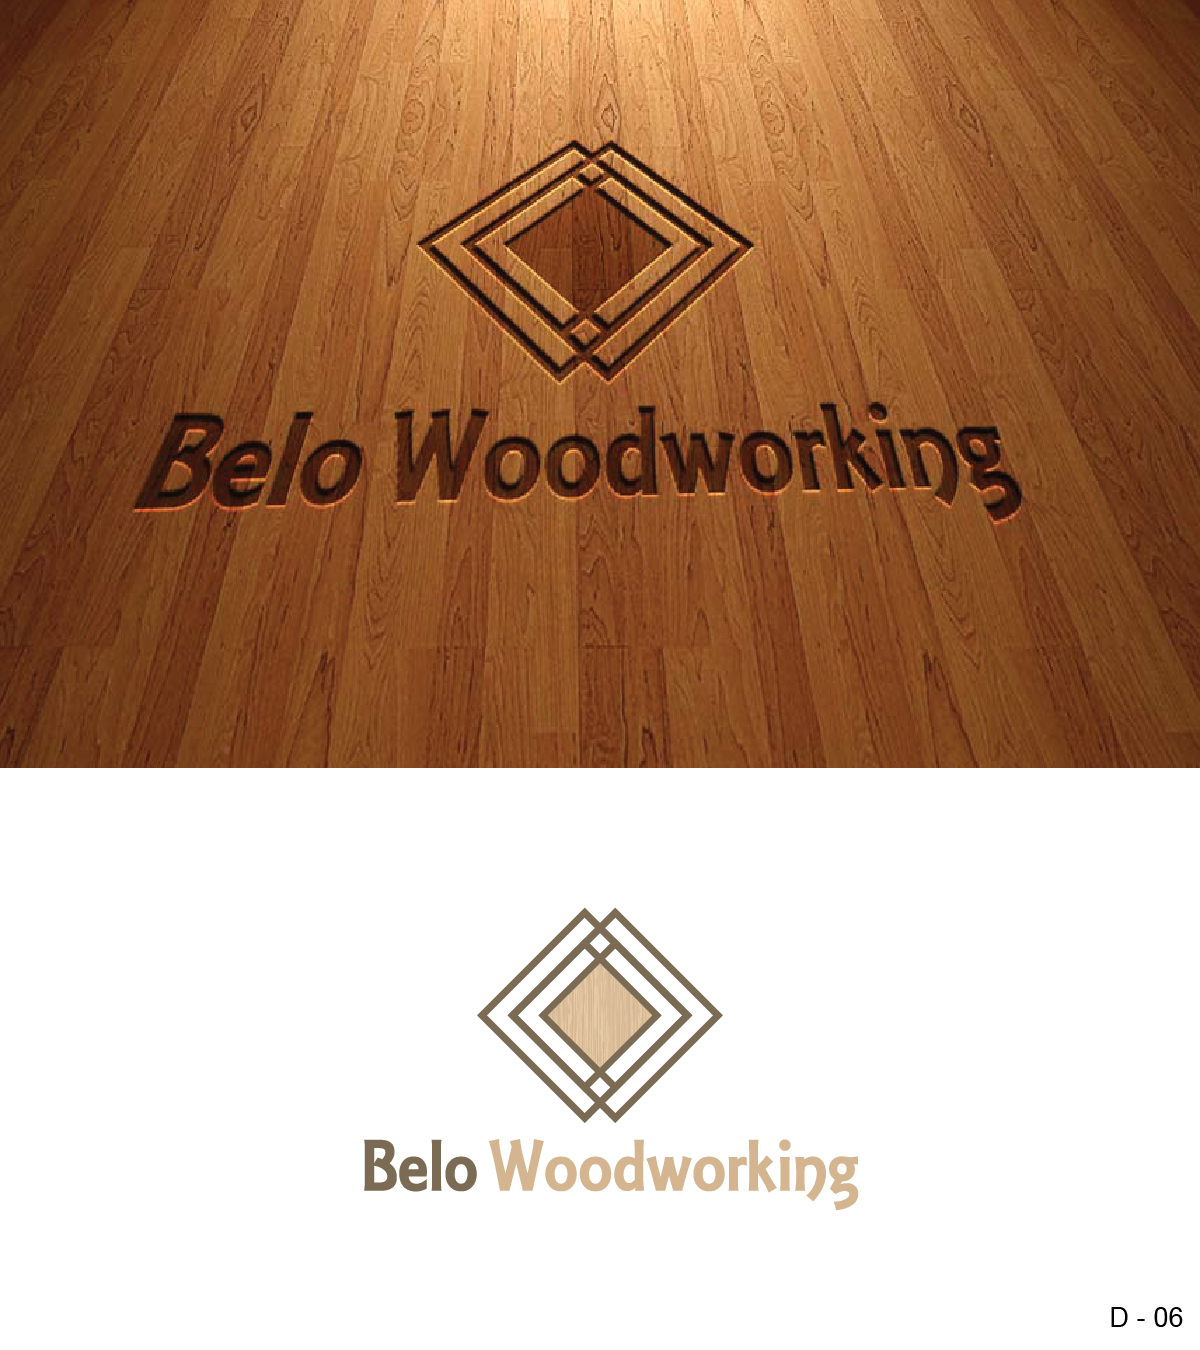 Elegant Serious It Company Logo Design For Belo Woodworking By Designanddevelopment Design 13309148